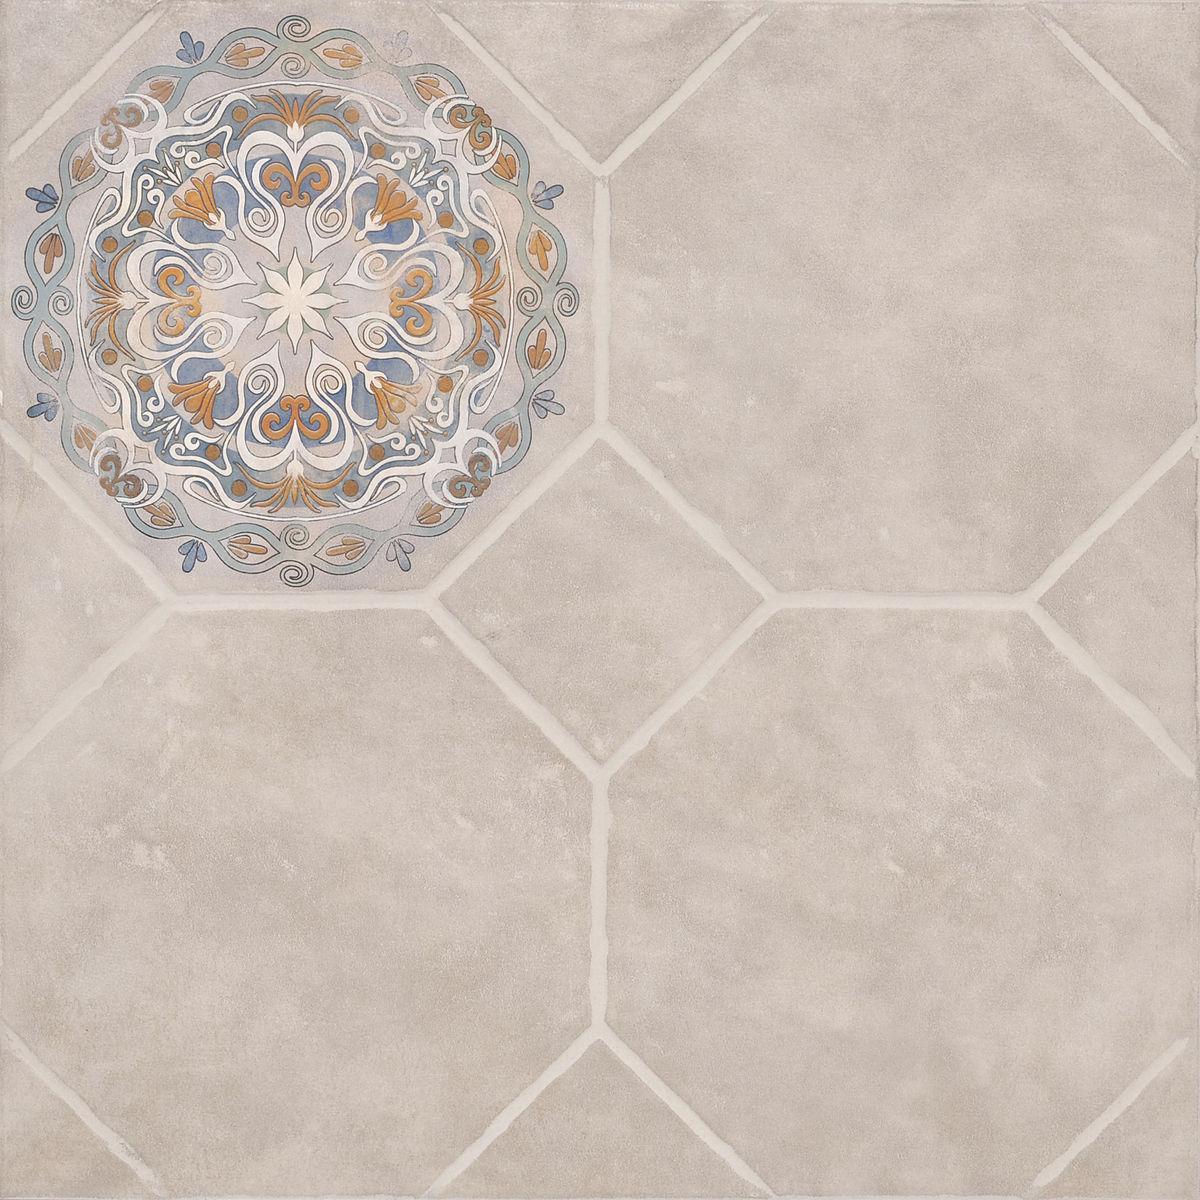 Deco octagon  bianco 45x45 (zwx81d) изображение 0